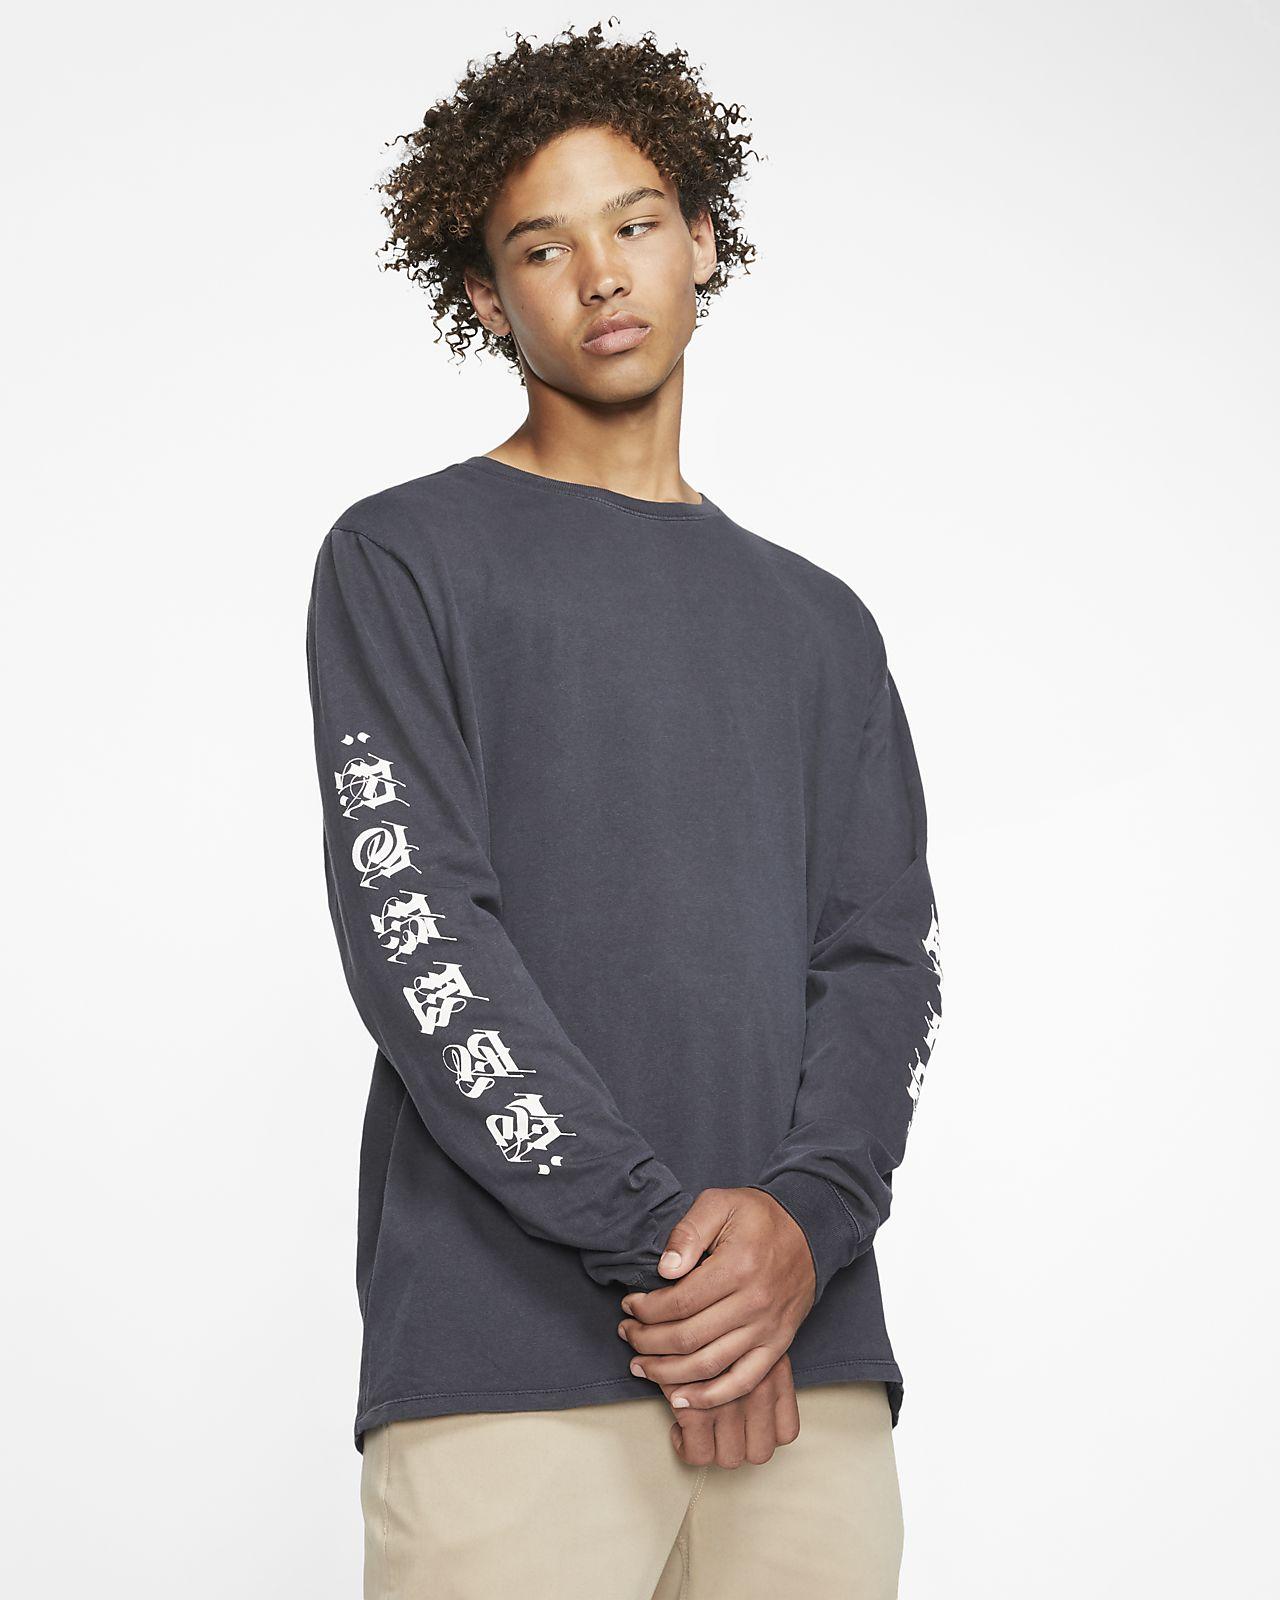 Hurley Cryptik Men's Long-Sleeve T-Shirt